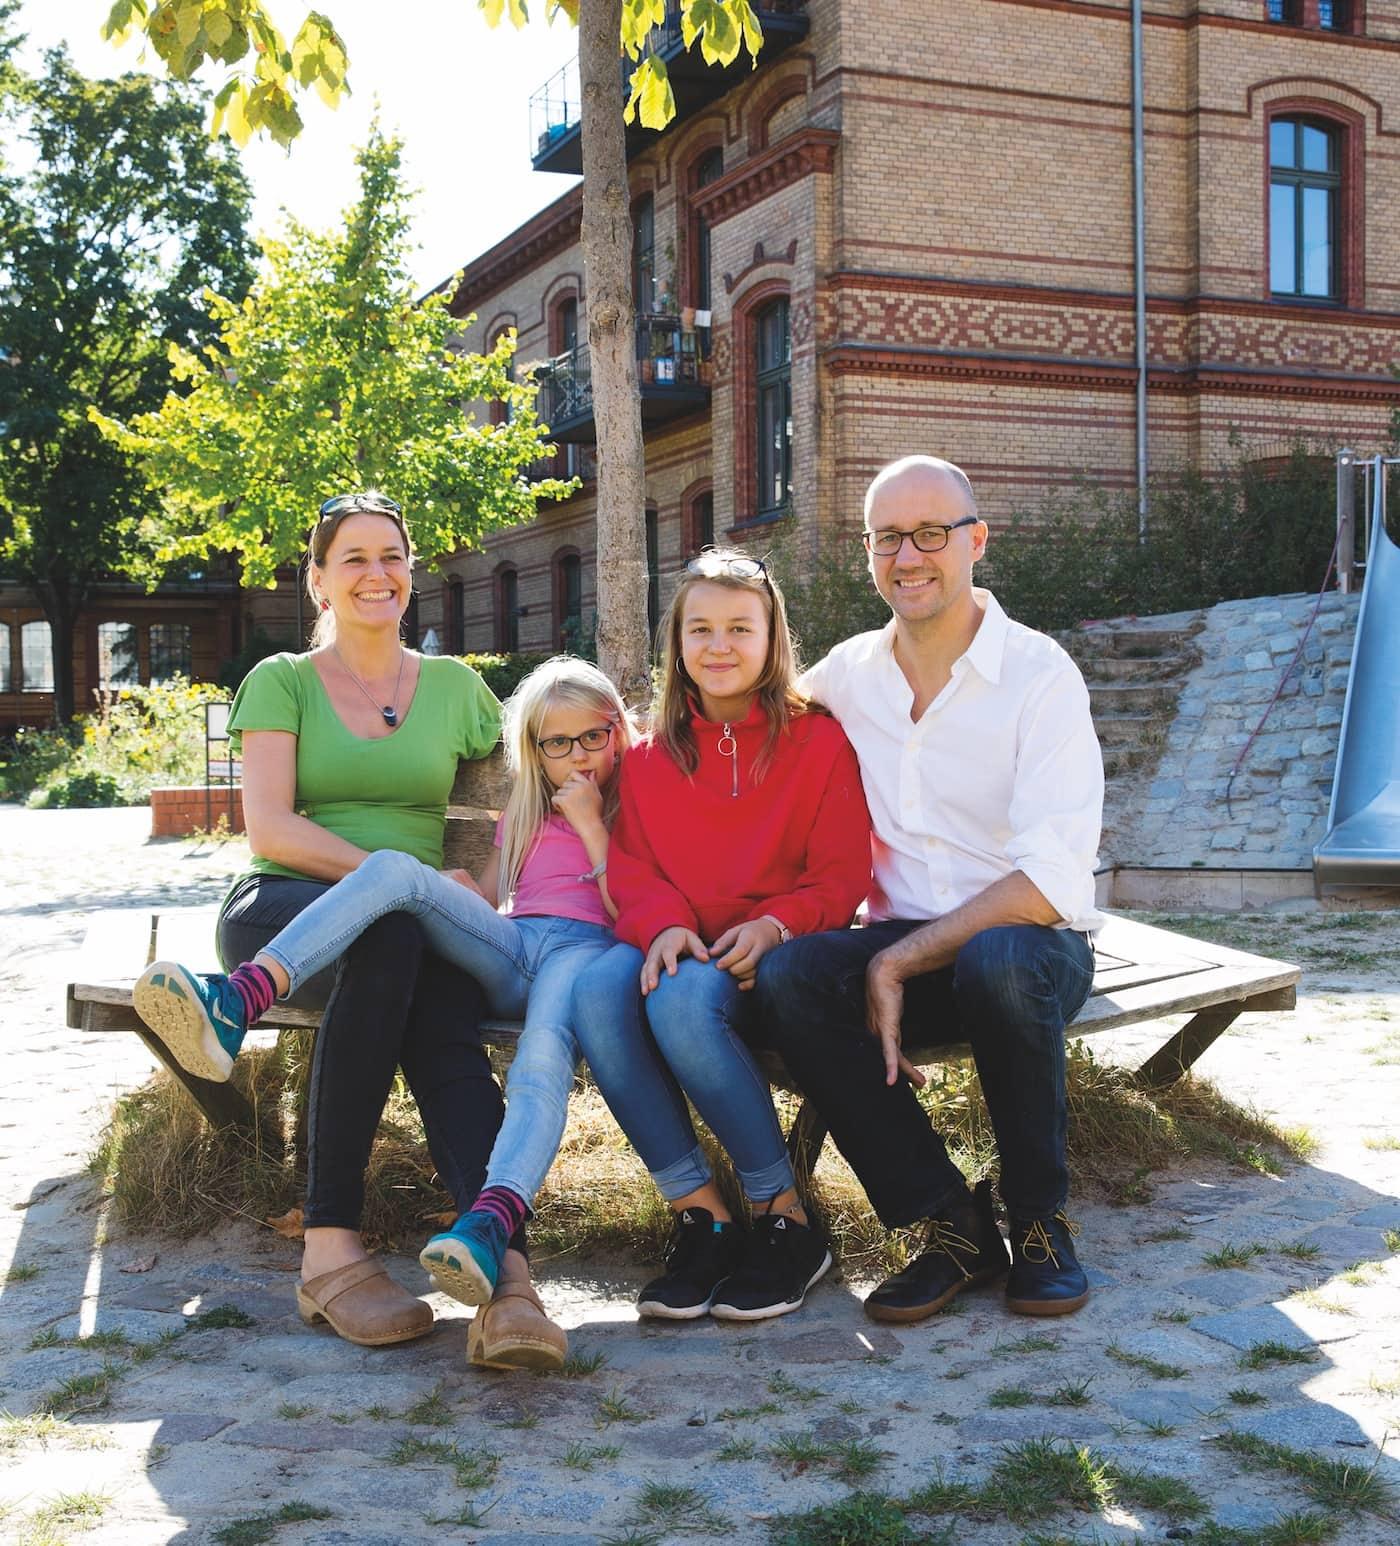 Familie grüner leben in Berlin // HIMBEER